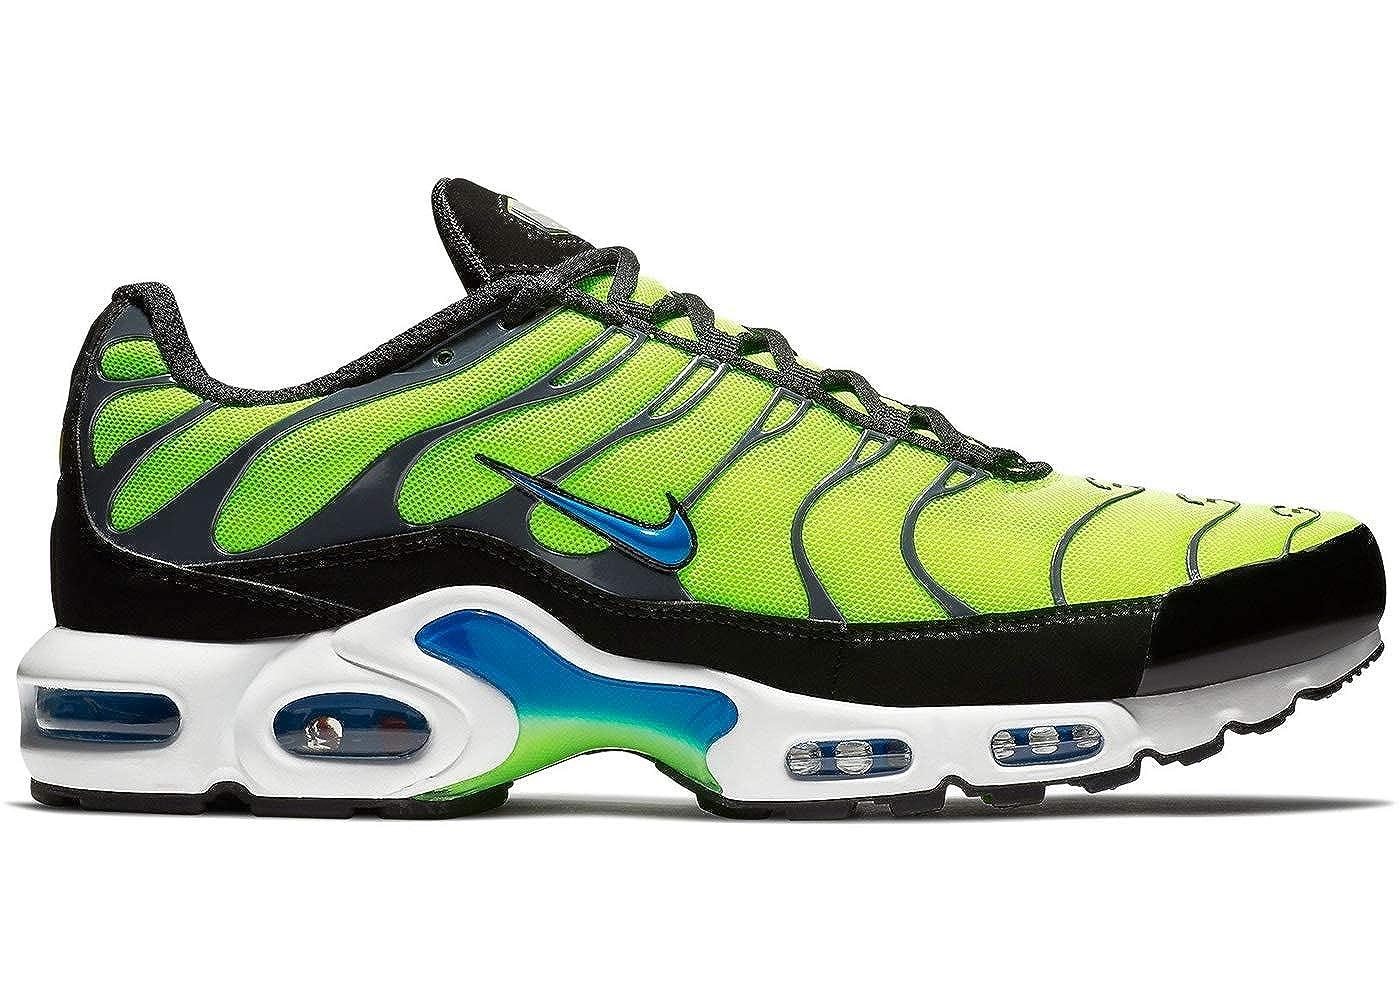 b4cce8ac73567 Amazon.com | Nike Air Max Plus Mens 852630-700 Size 11.5 | Running